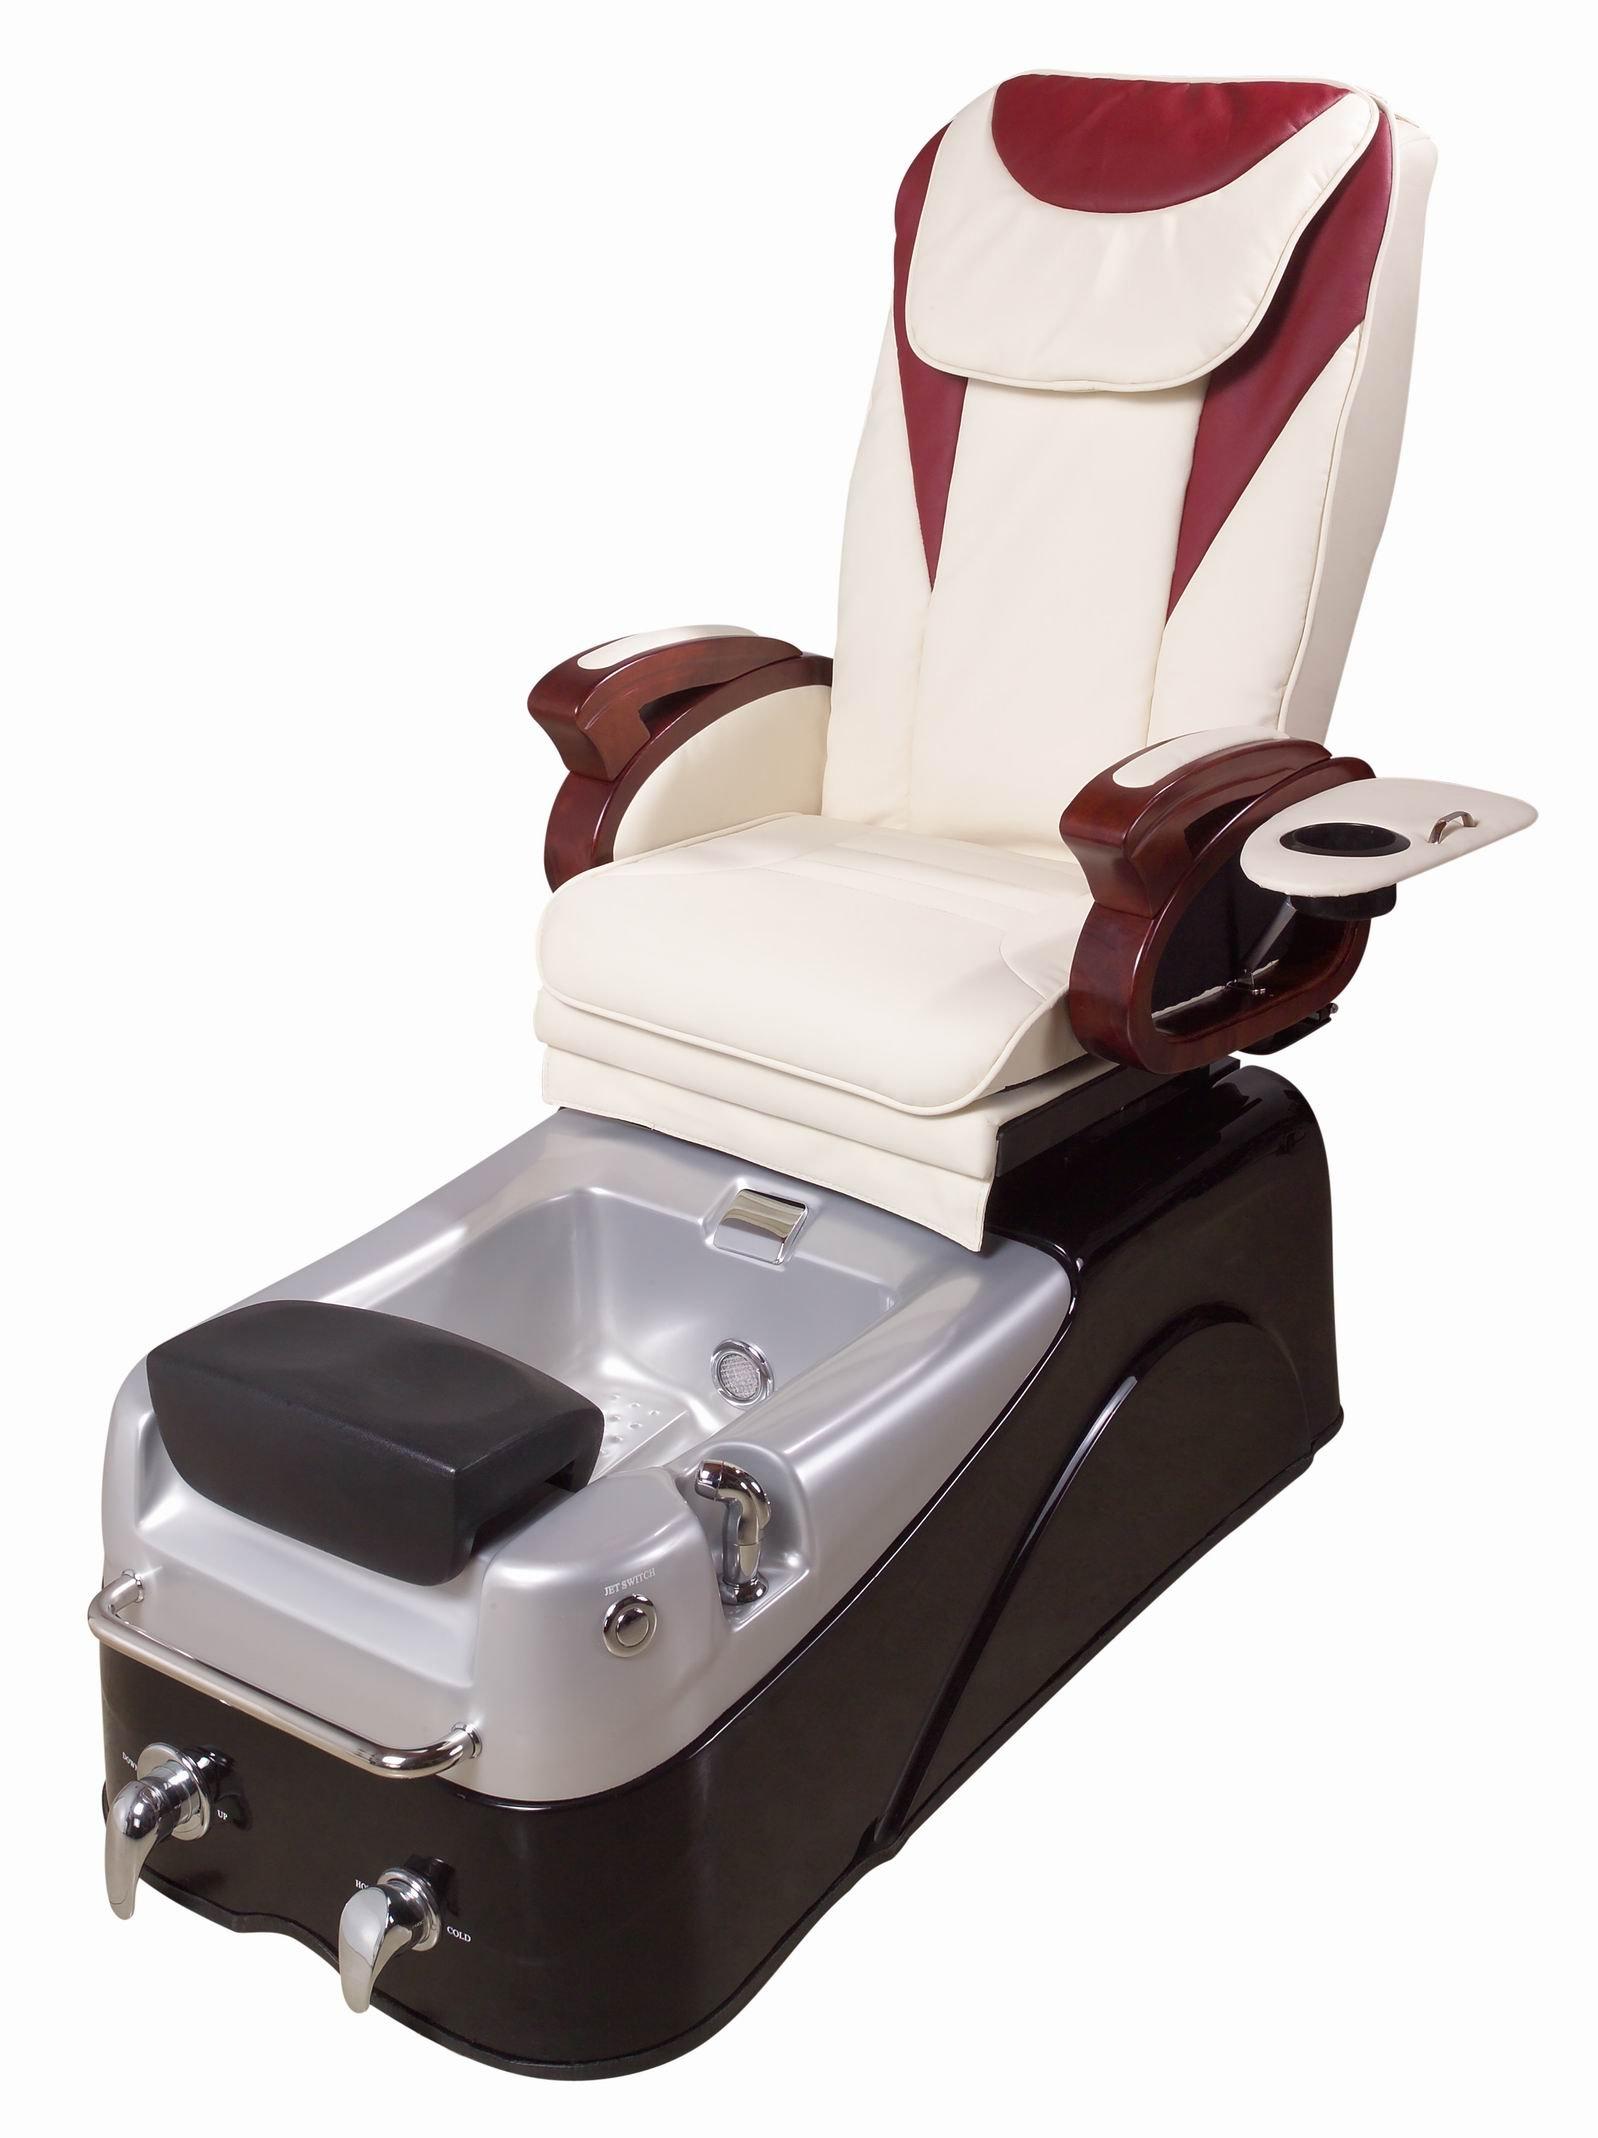 top rated pedicure chairs designer executive chair تجهيز صولين حلاقه ومشاغل نسائيه ت 0567786400 ديكور